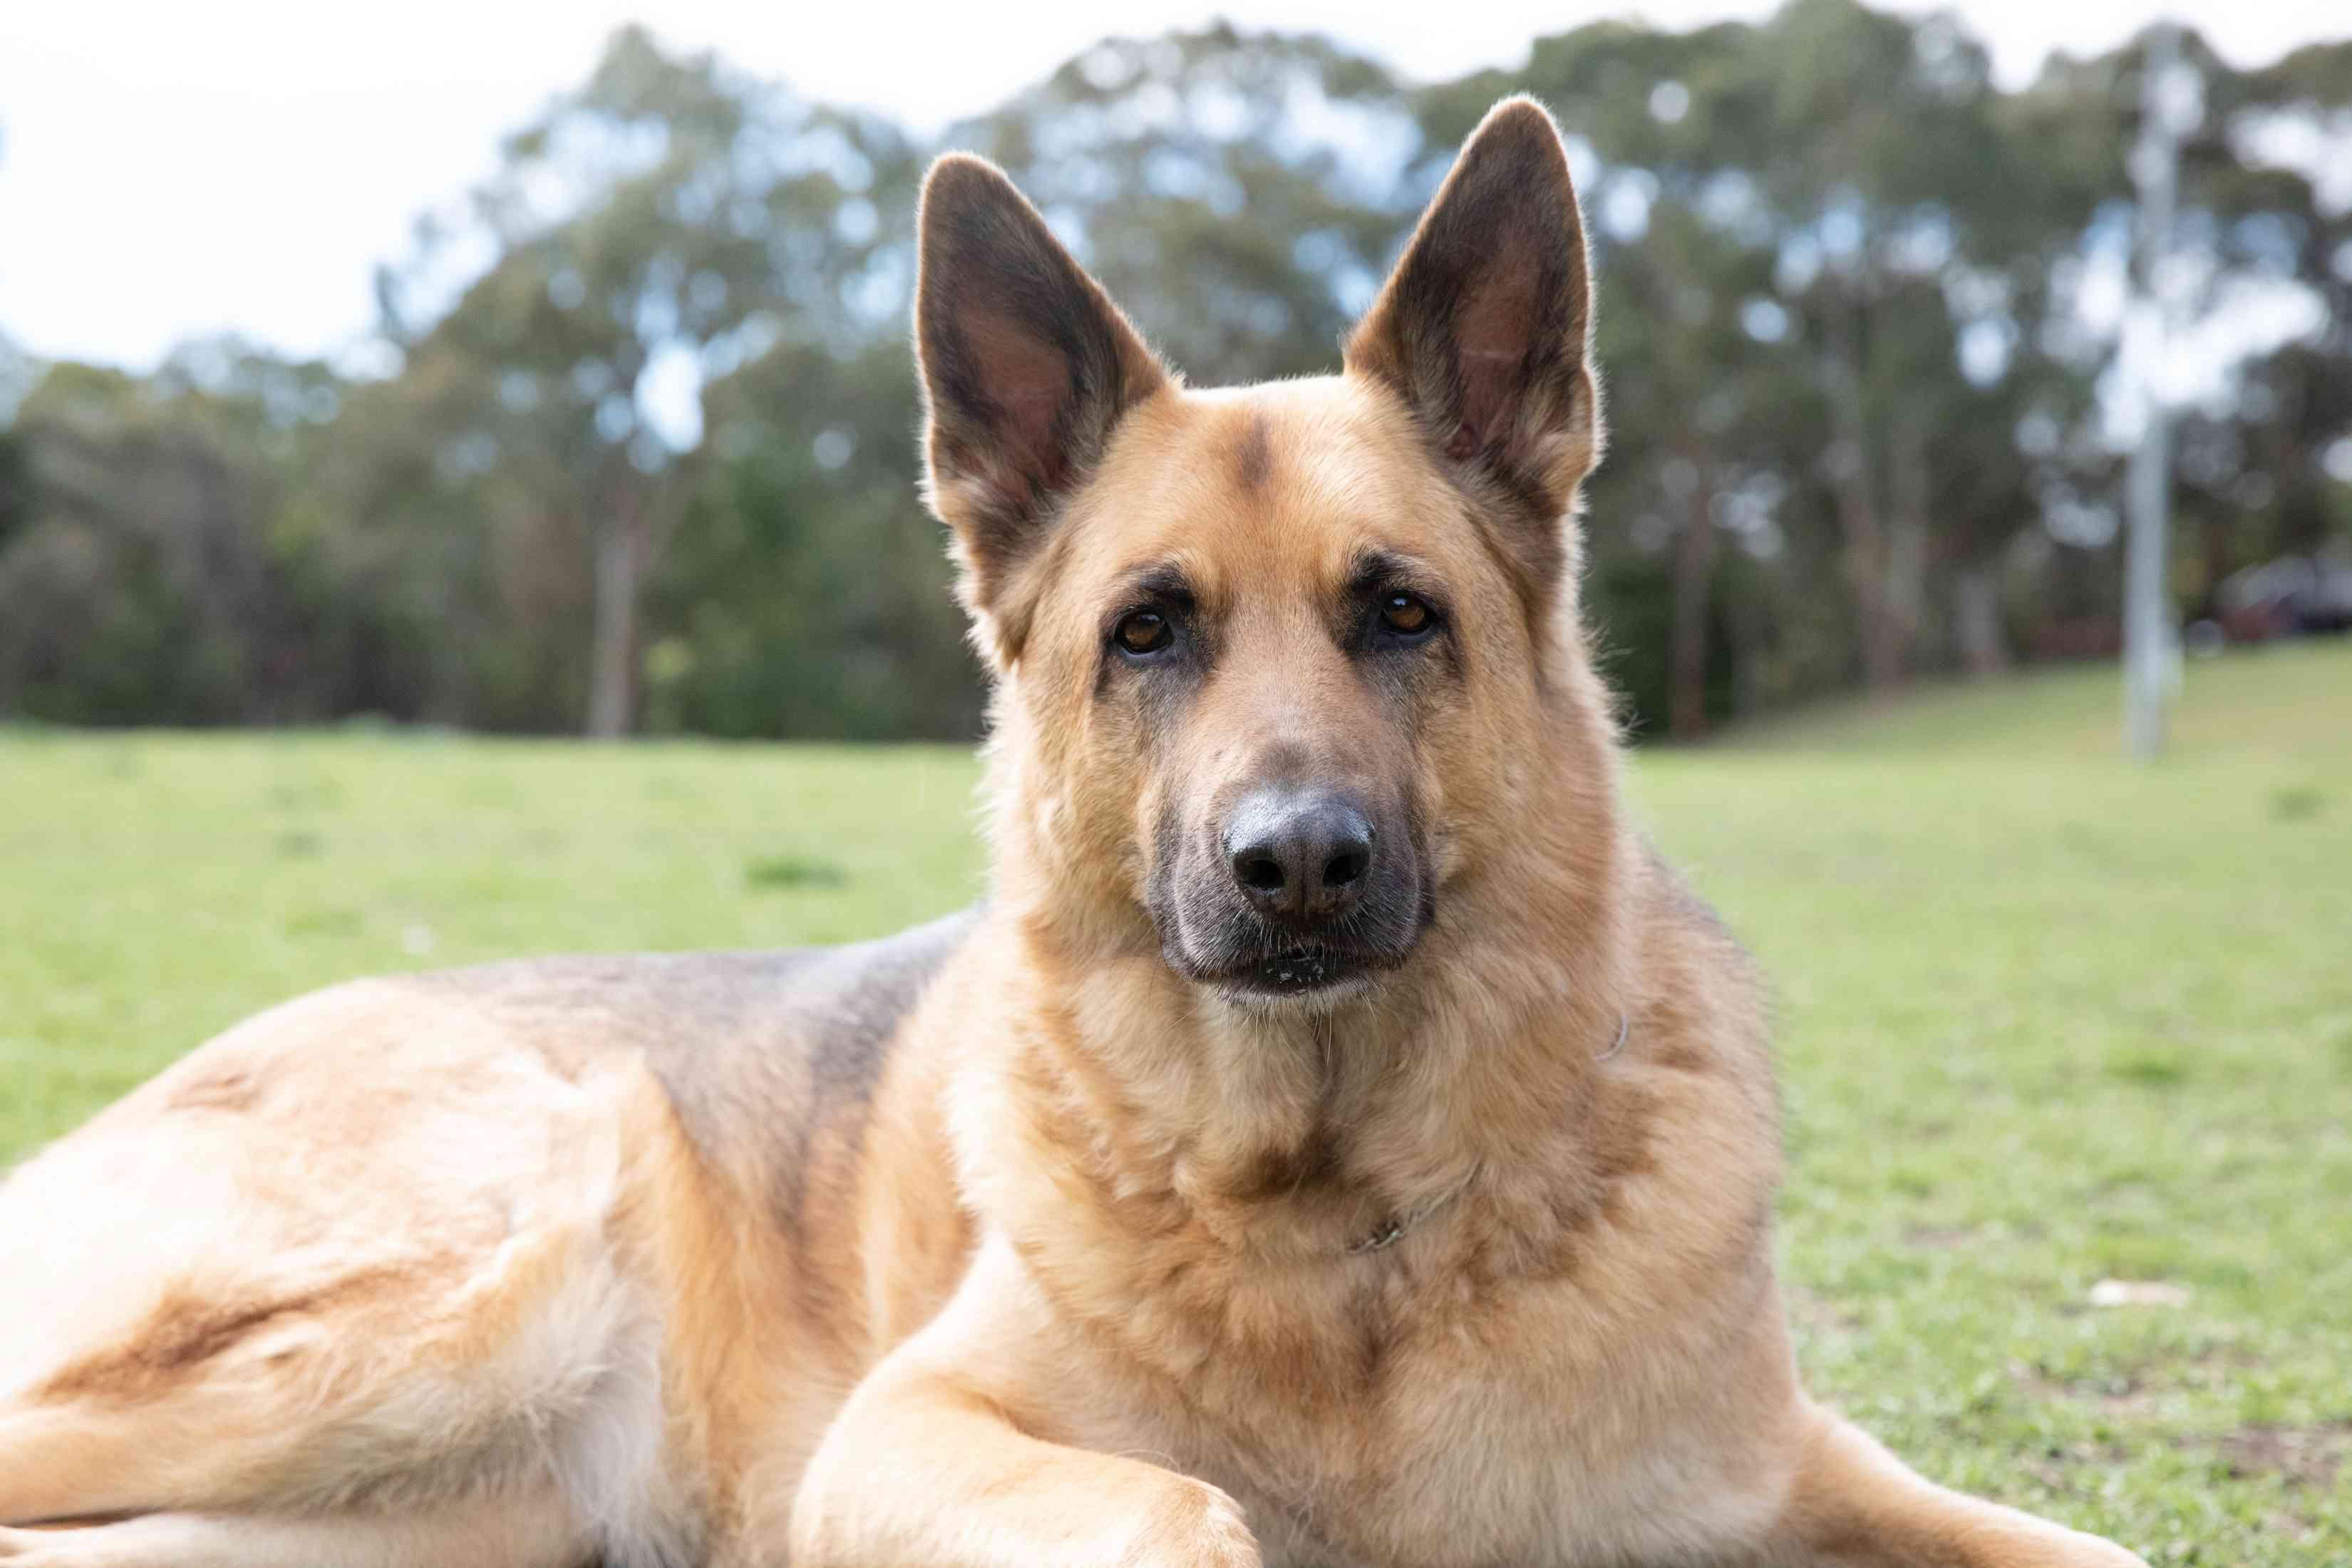 German shepherd dog with light brown fur coat laying on grass